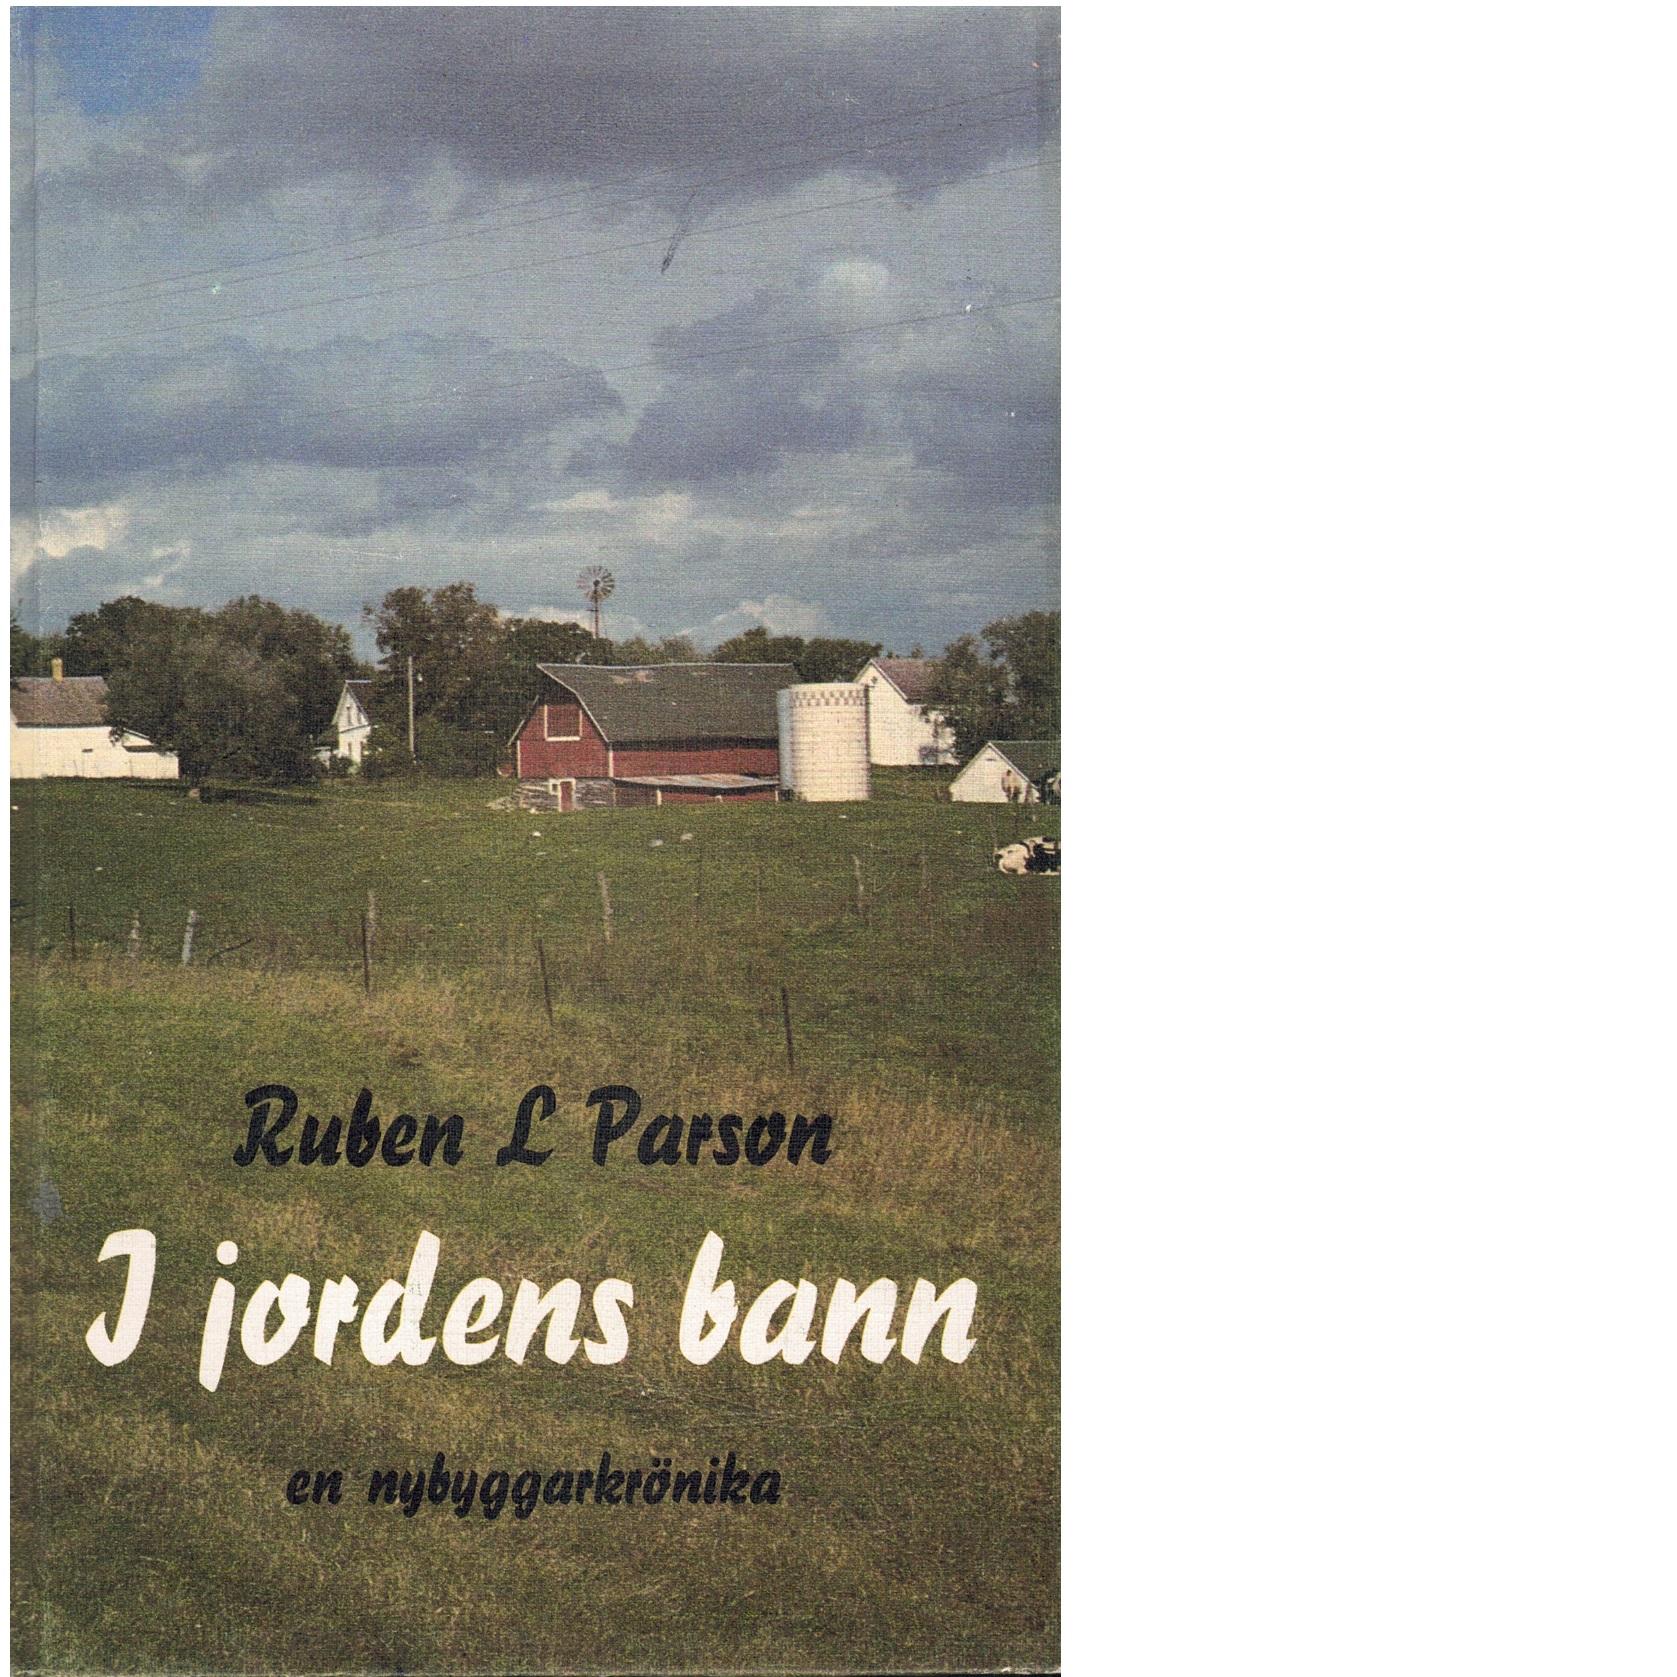 I jordens bann : en nybyggarkrönika - Parson, Ruben L.